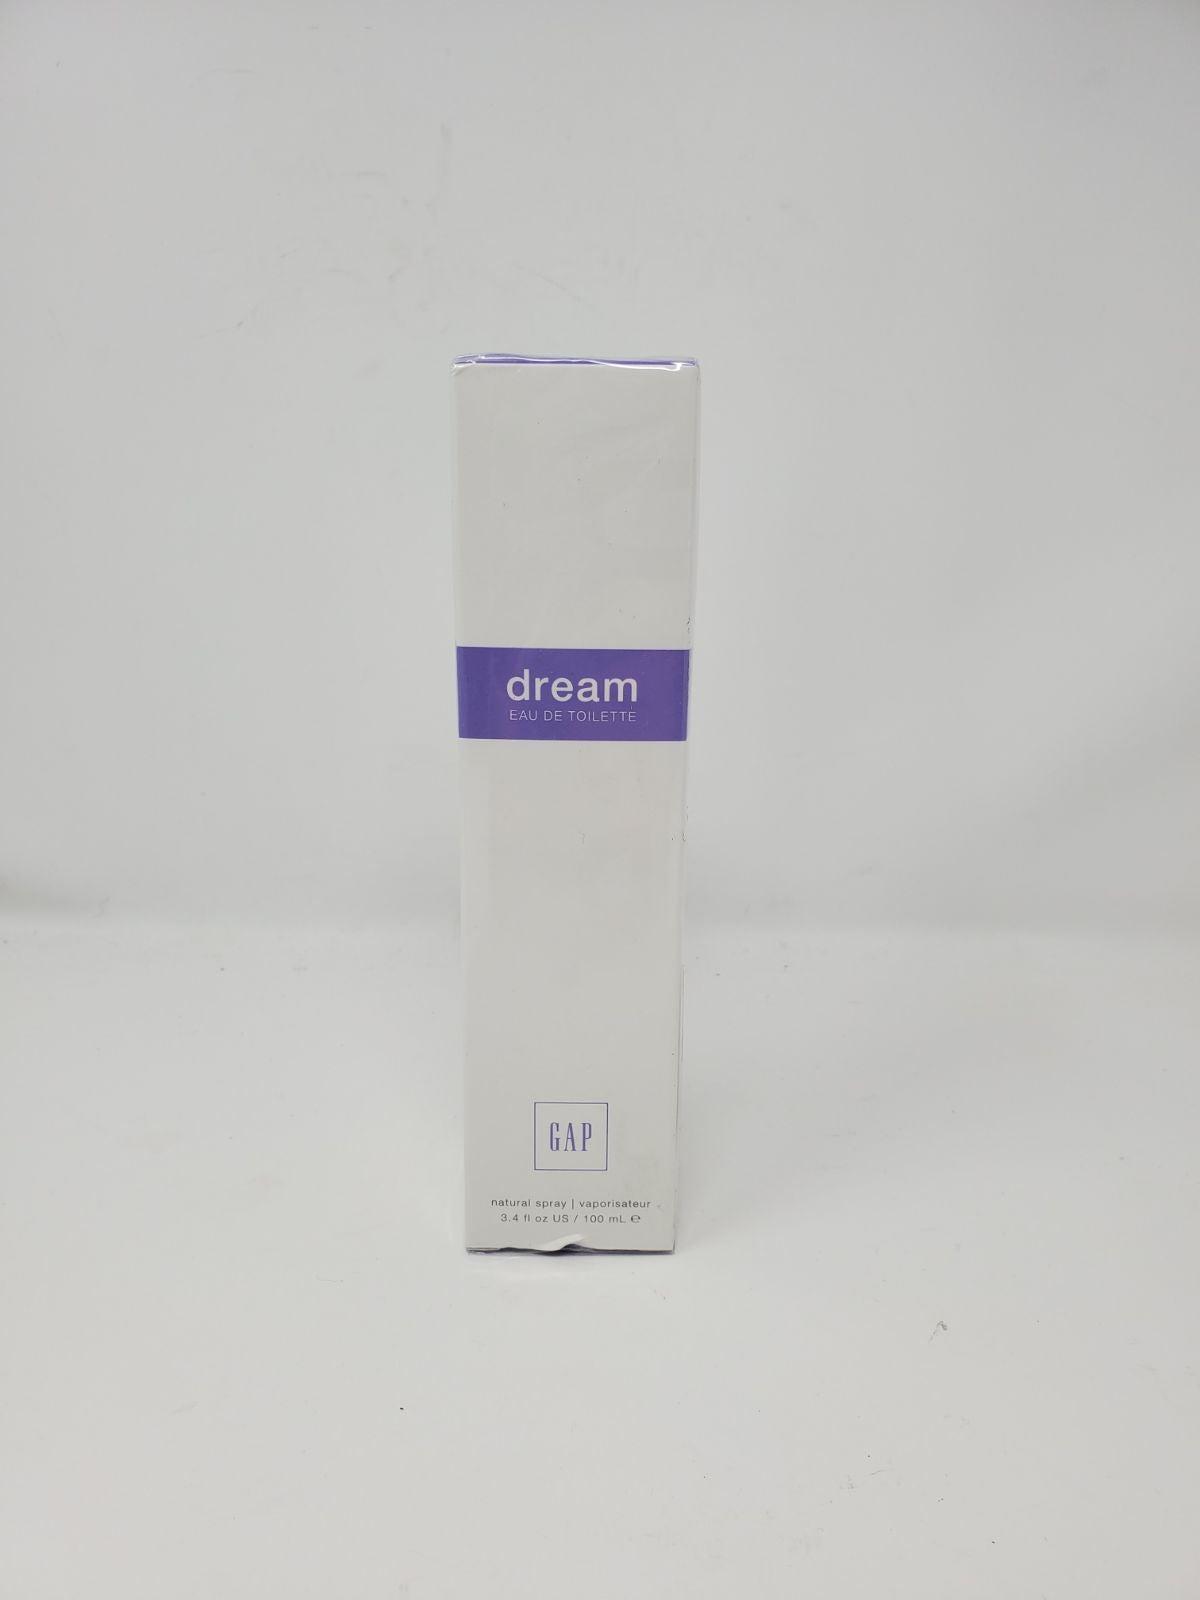 gap dream perfume Eau De Toilette 3.4 Fl